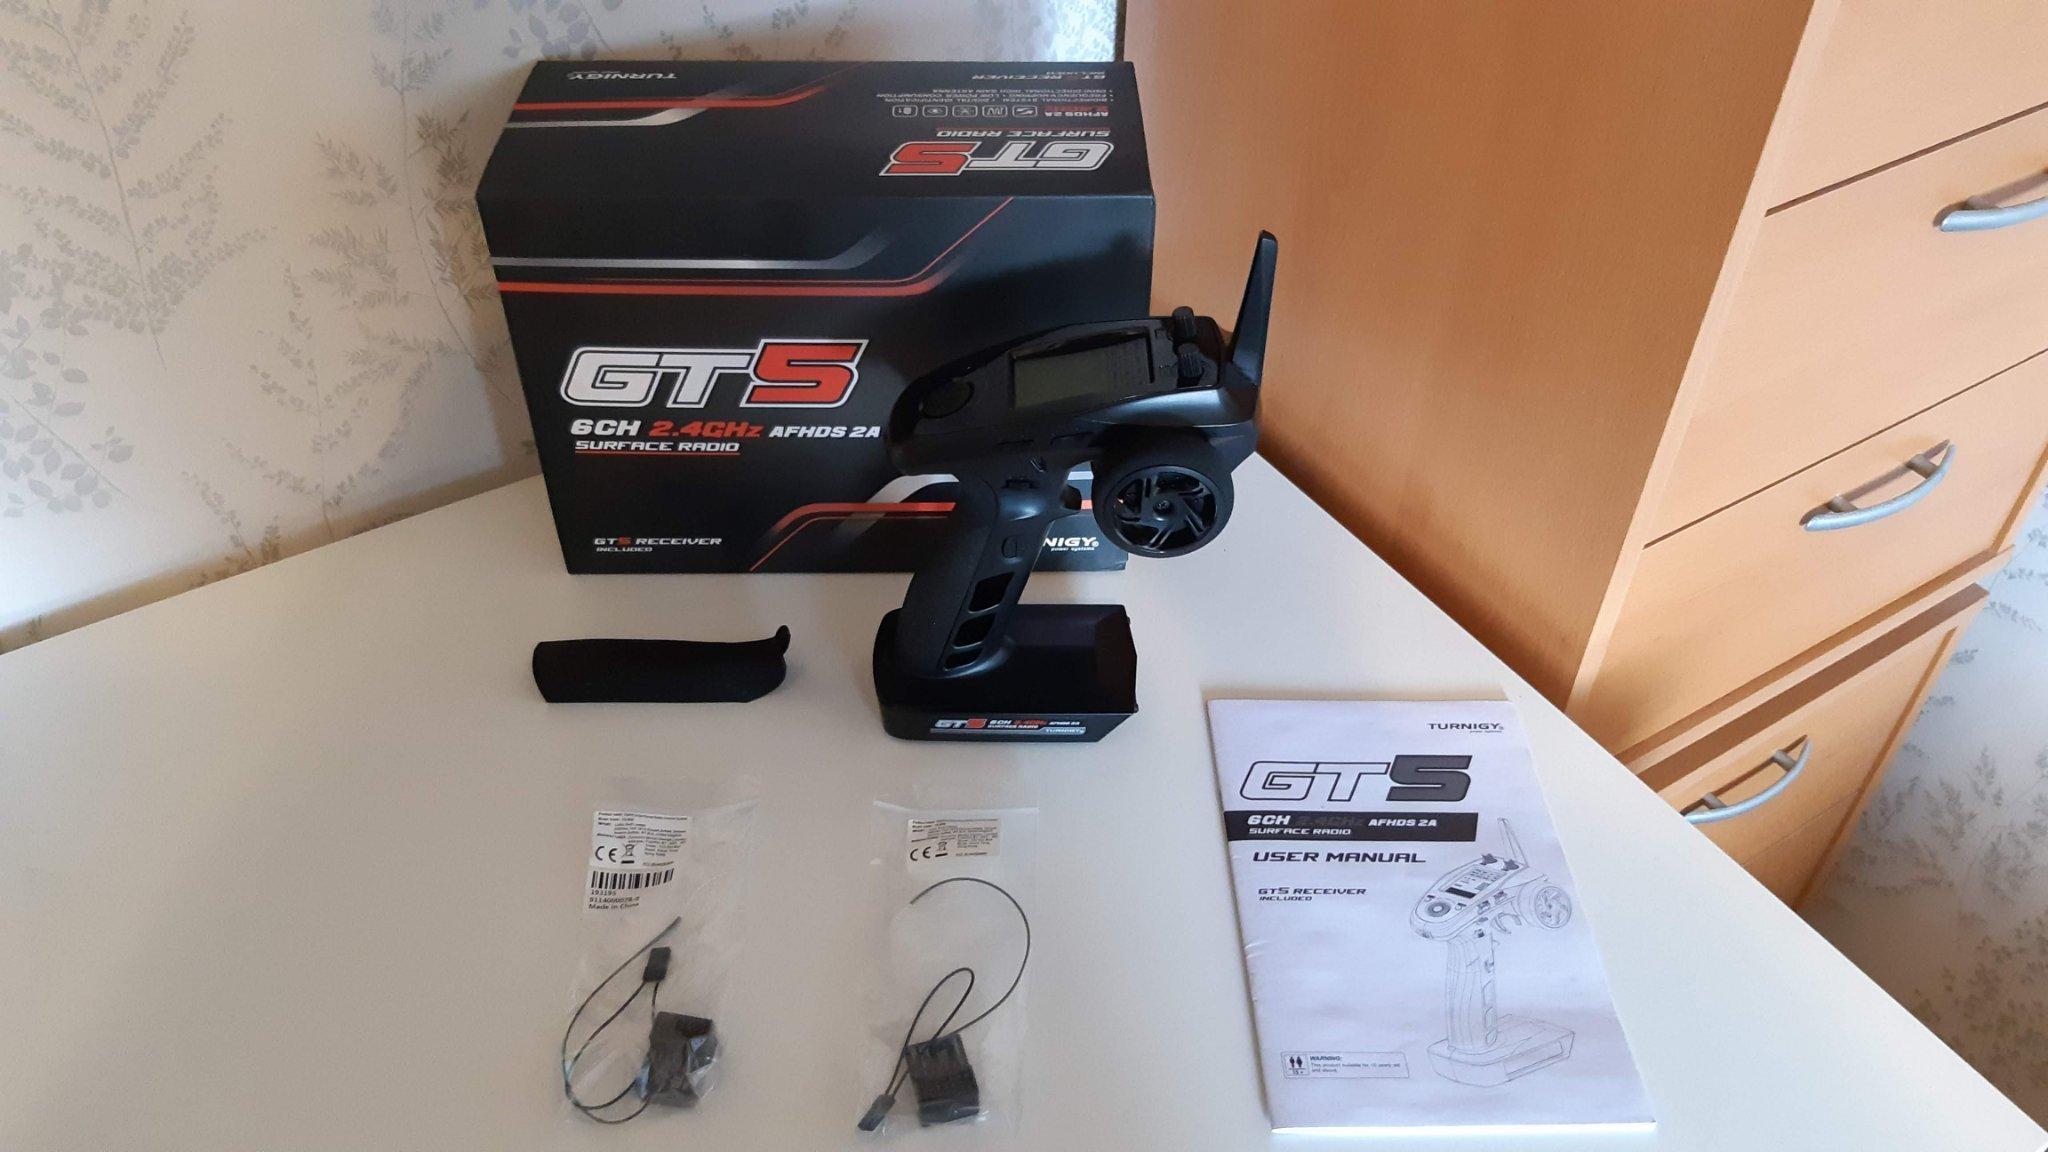 Rattradio Turnigy / Flysky GT5 6-Kanals radio m   (348080606) ᐈ Köp